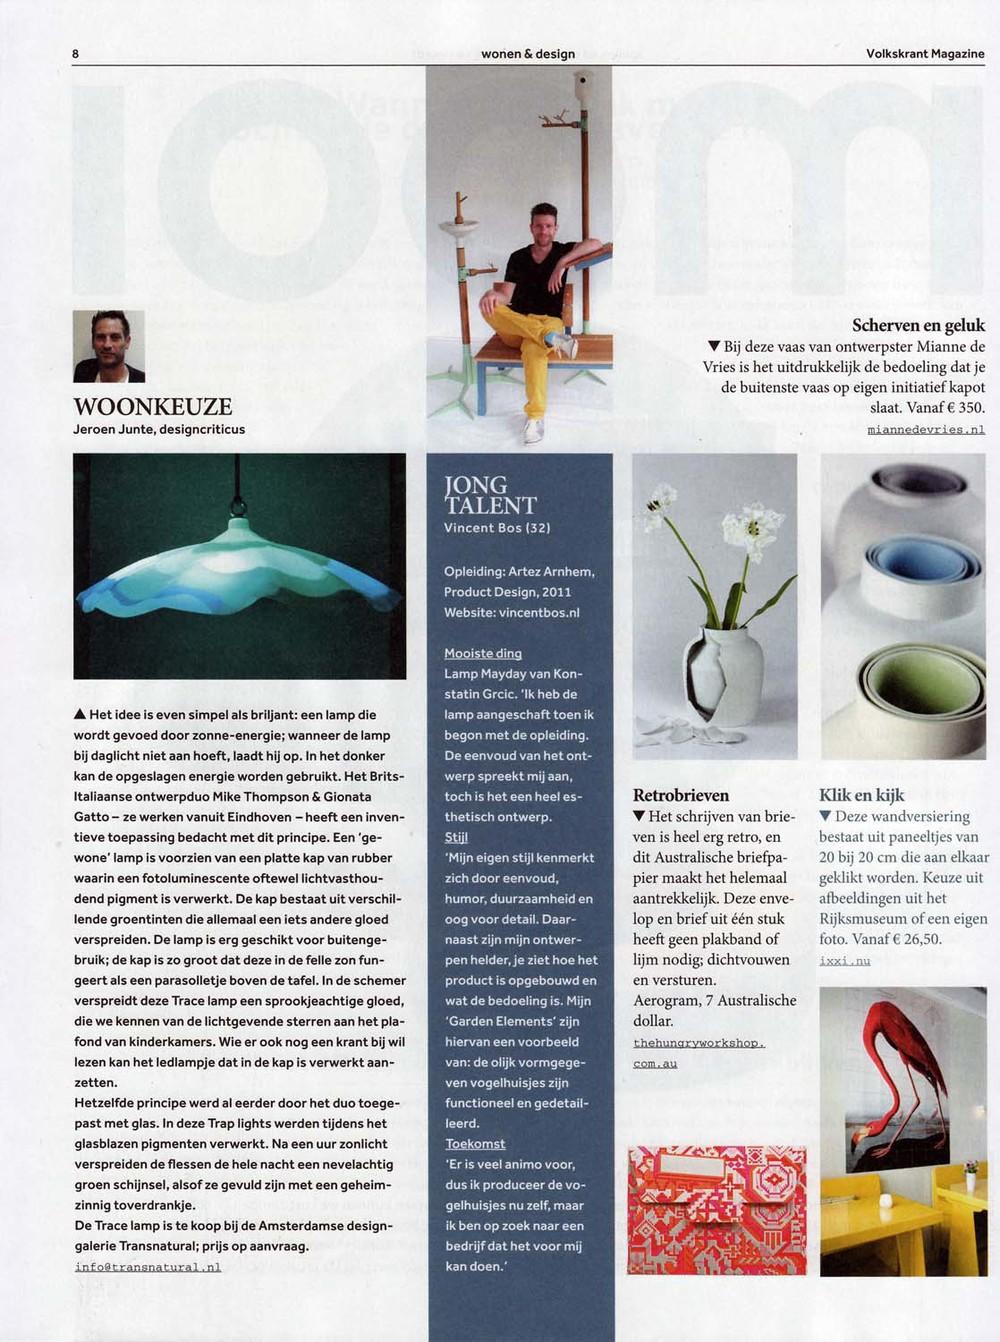 Vincent_Bos_Ontwerpen_Volkskrant_Magazine.jpg